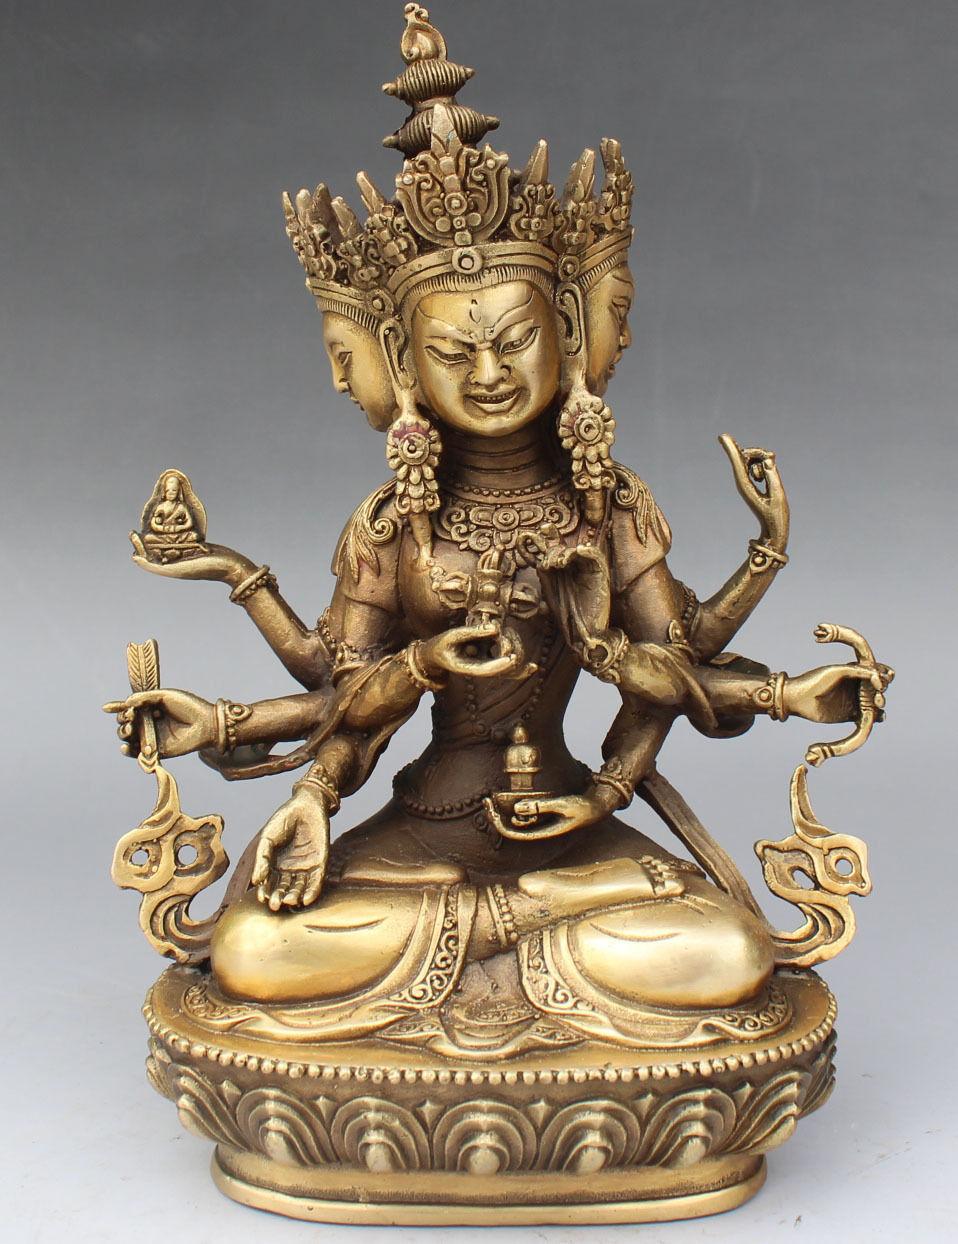 9 Tibet Buddhism BRASS 3 Head 8 Arms Namgyalma & Ushnishavijaya Buddha Statue poppy flower9 Tibet Buddhism BRASS 3 Head 8 Arms Namgyalma & Ushnishavijaya Buddha Statue poppy flower